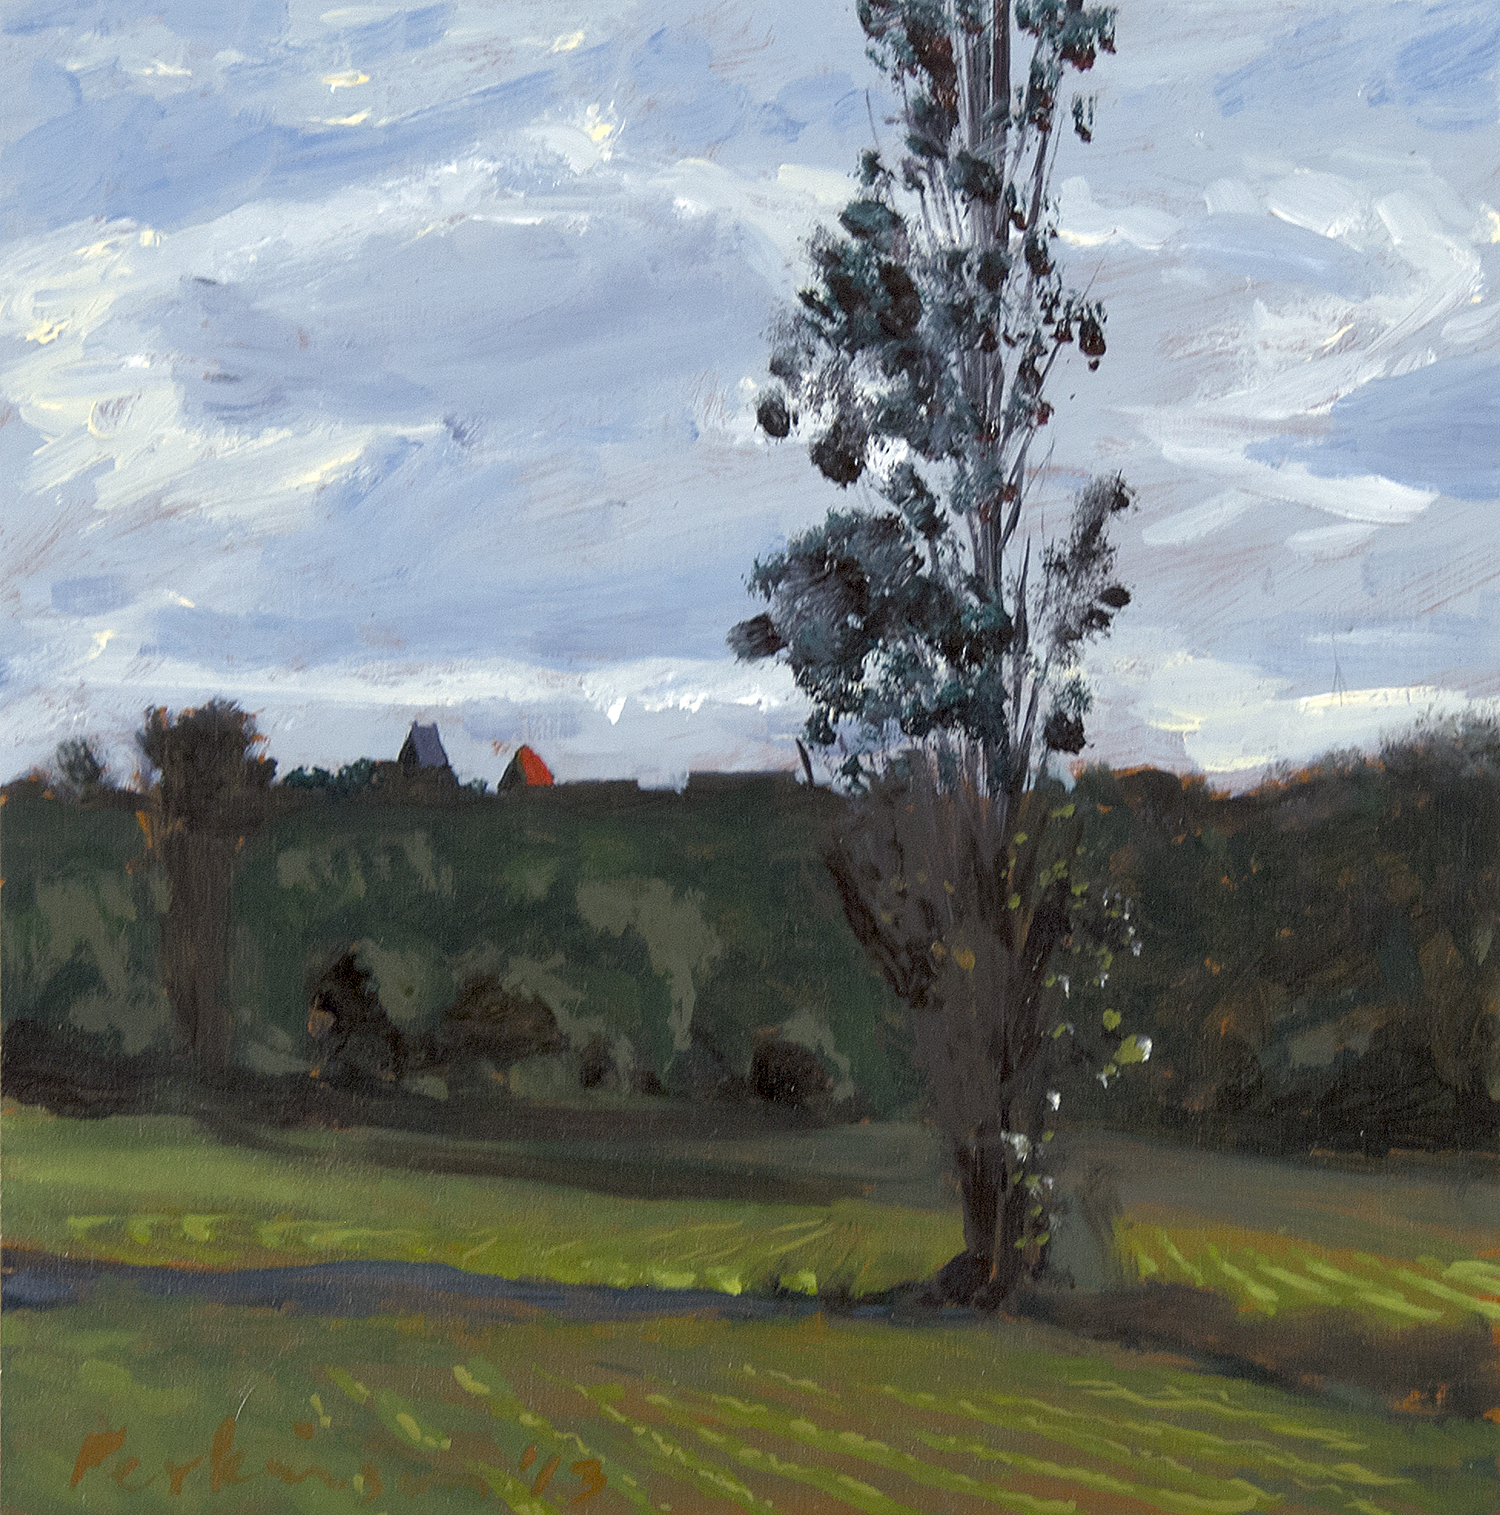 Perkinson_Tree+in+Field,+France.jpg